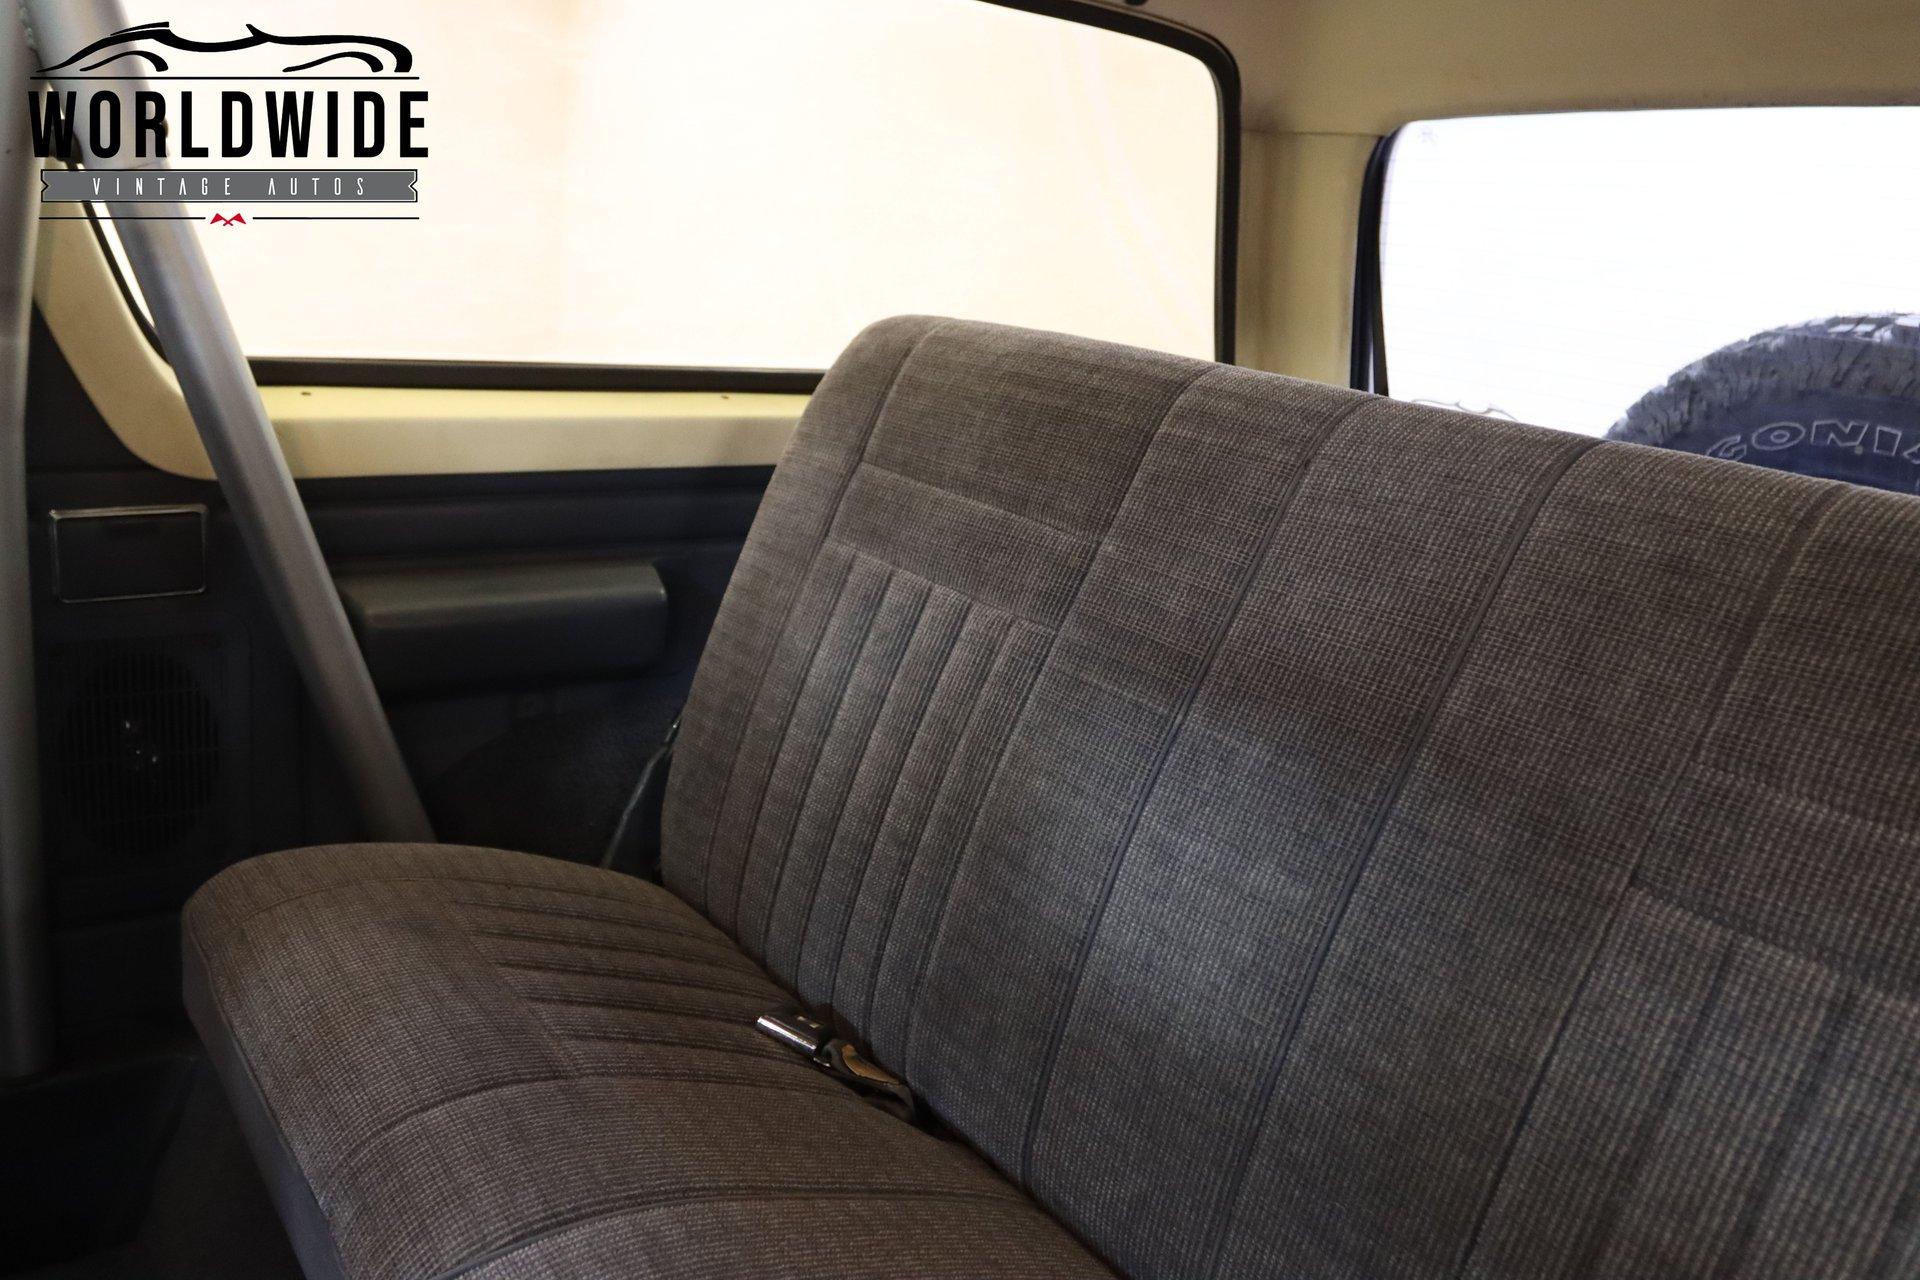 1989 Ford Bronco XLT